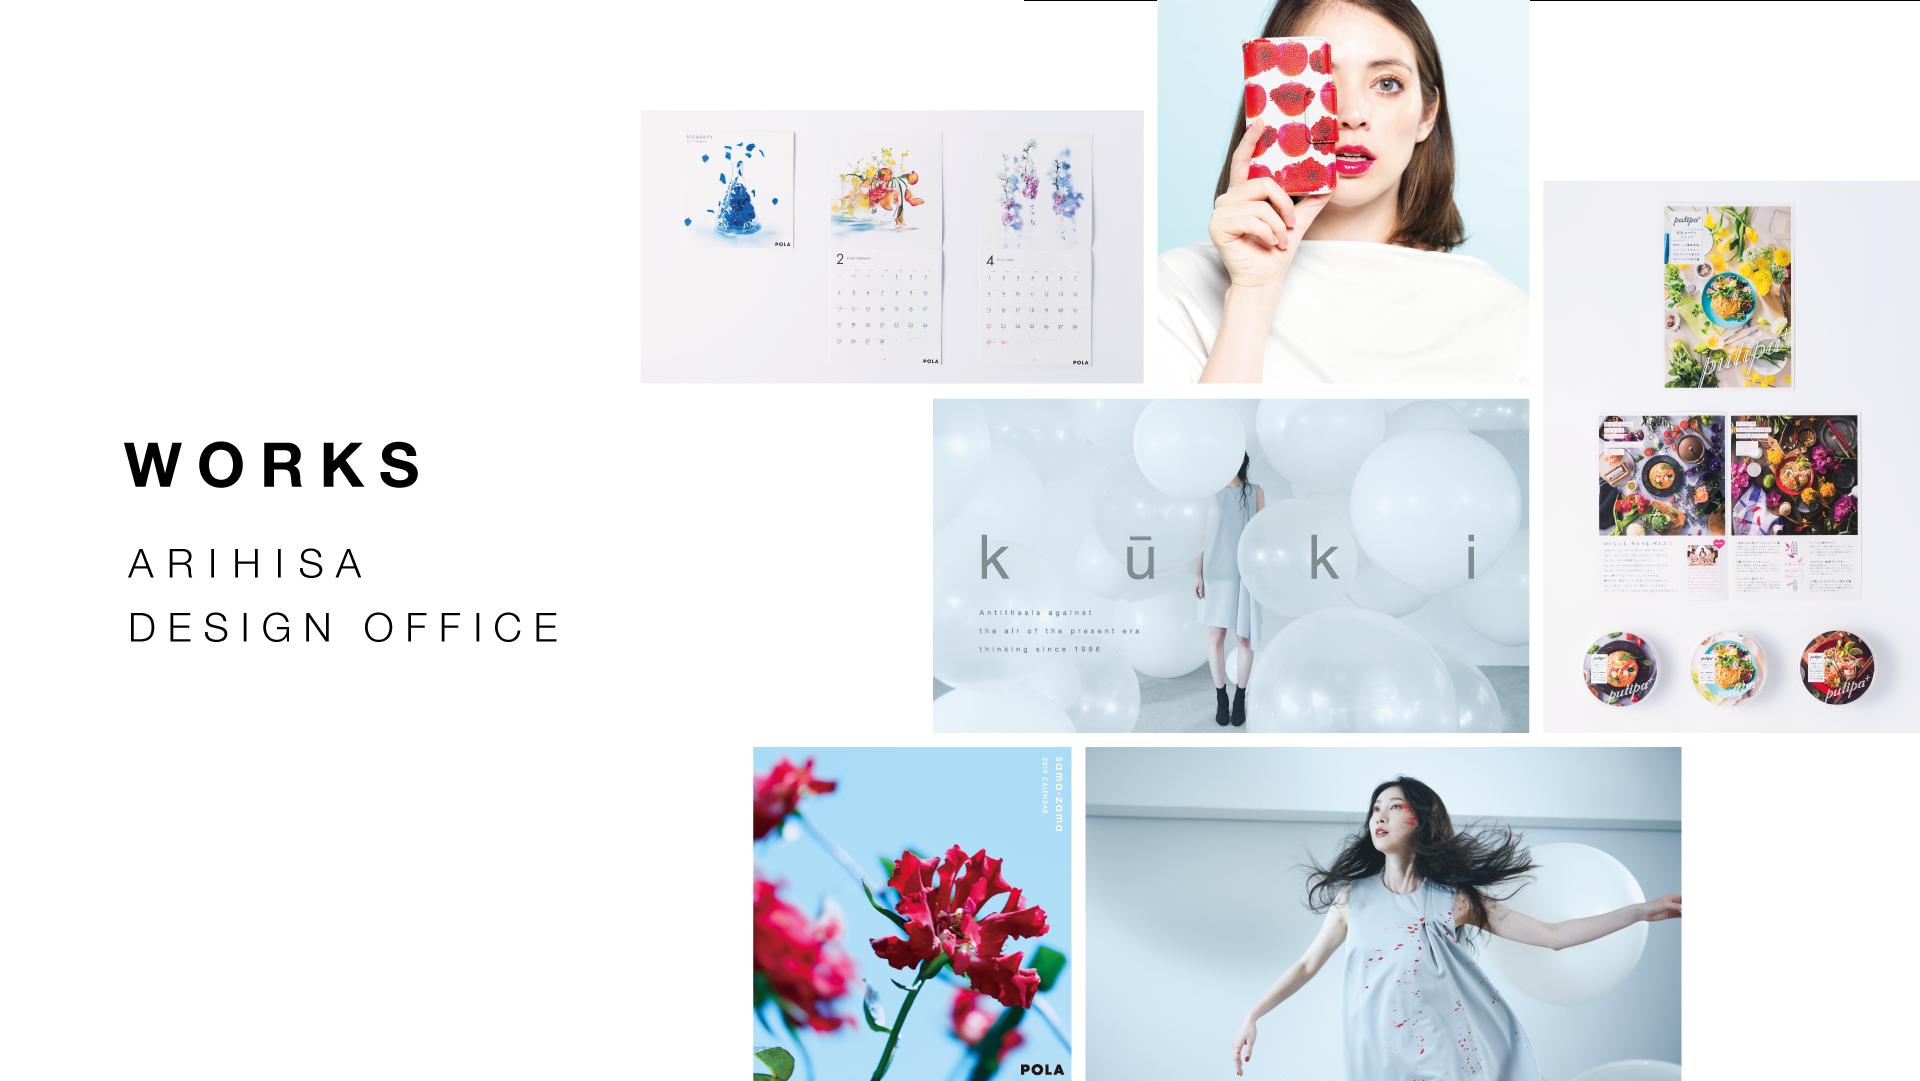 WORKS / ARIHISA DESIGN OFFICE